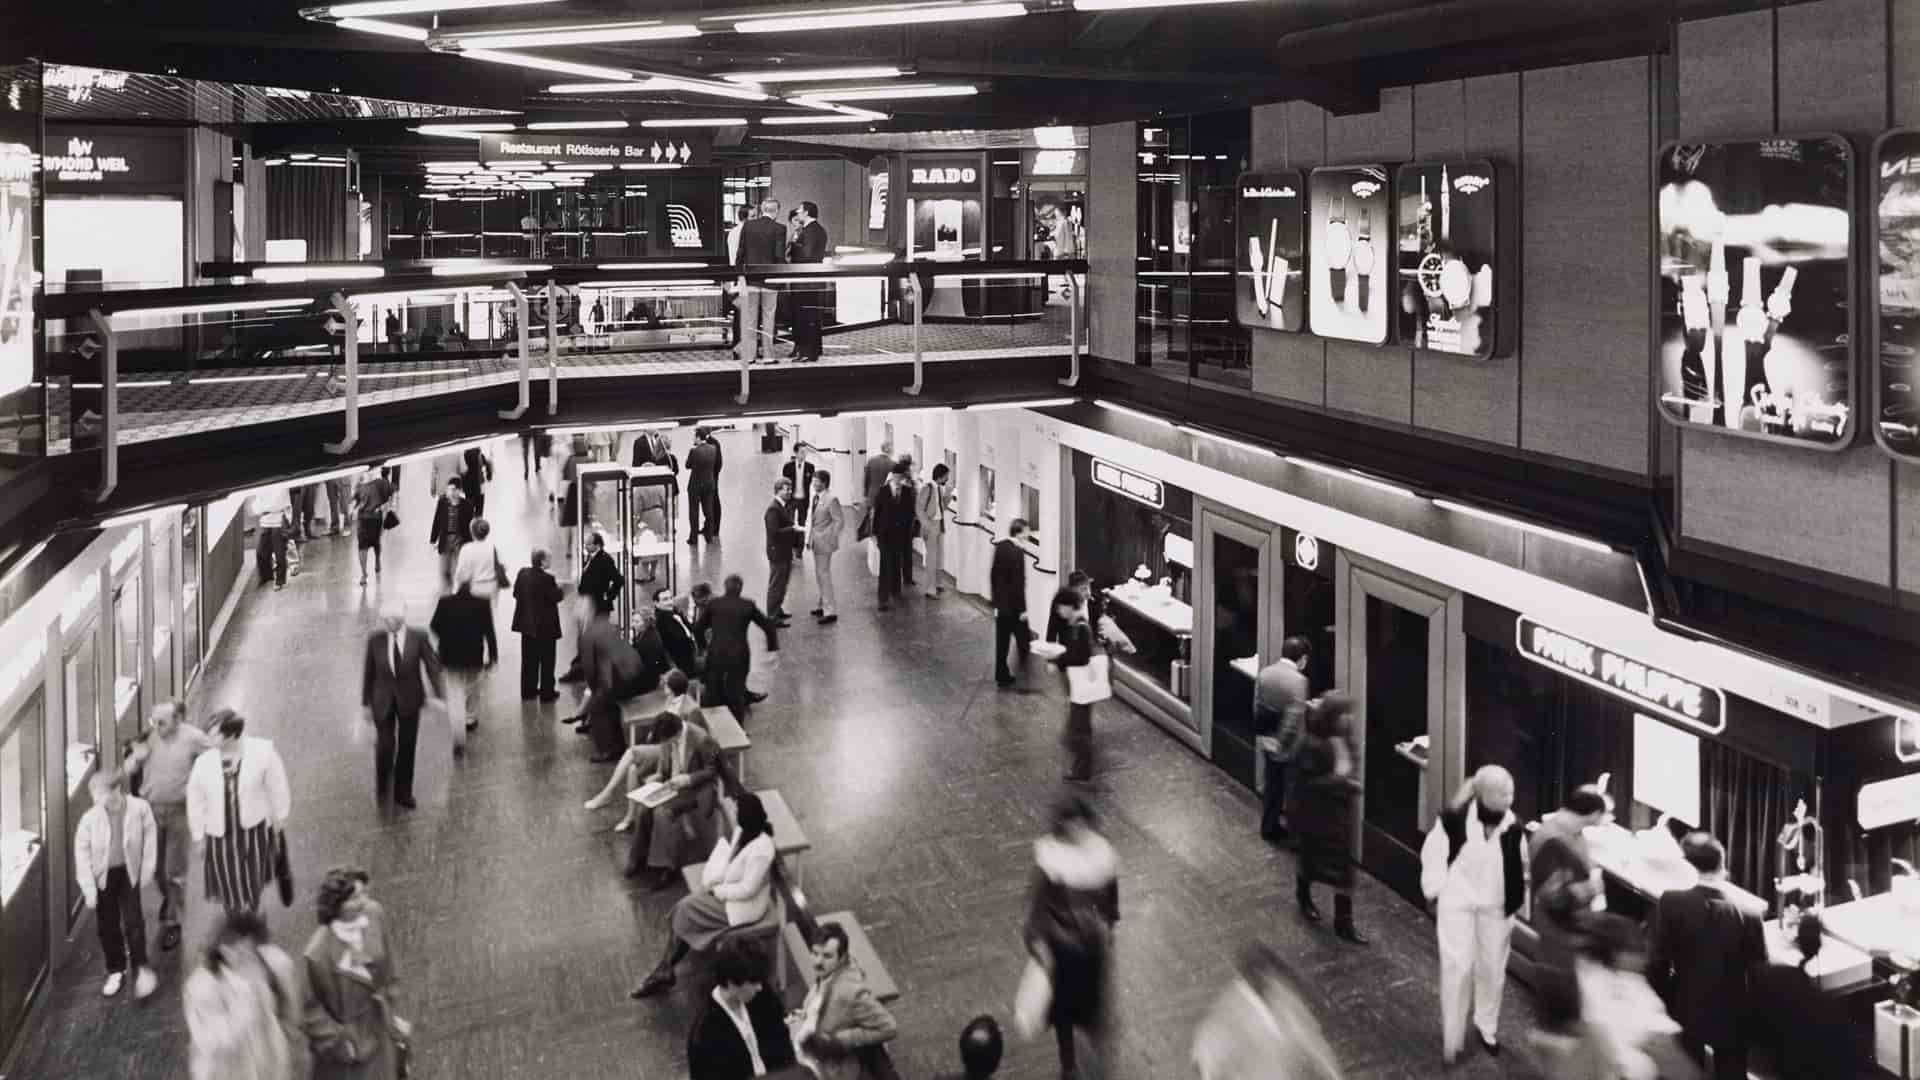 Baselworld exhibition 1986